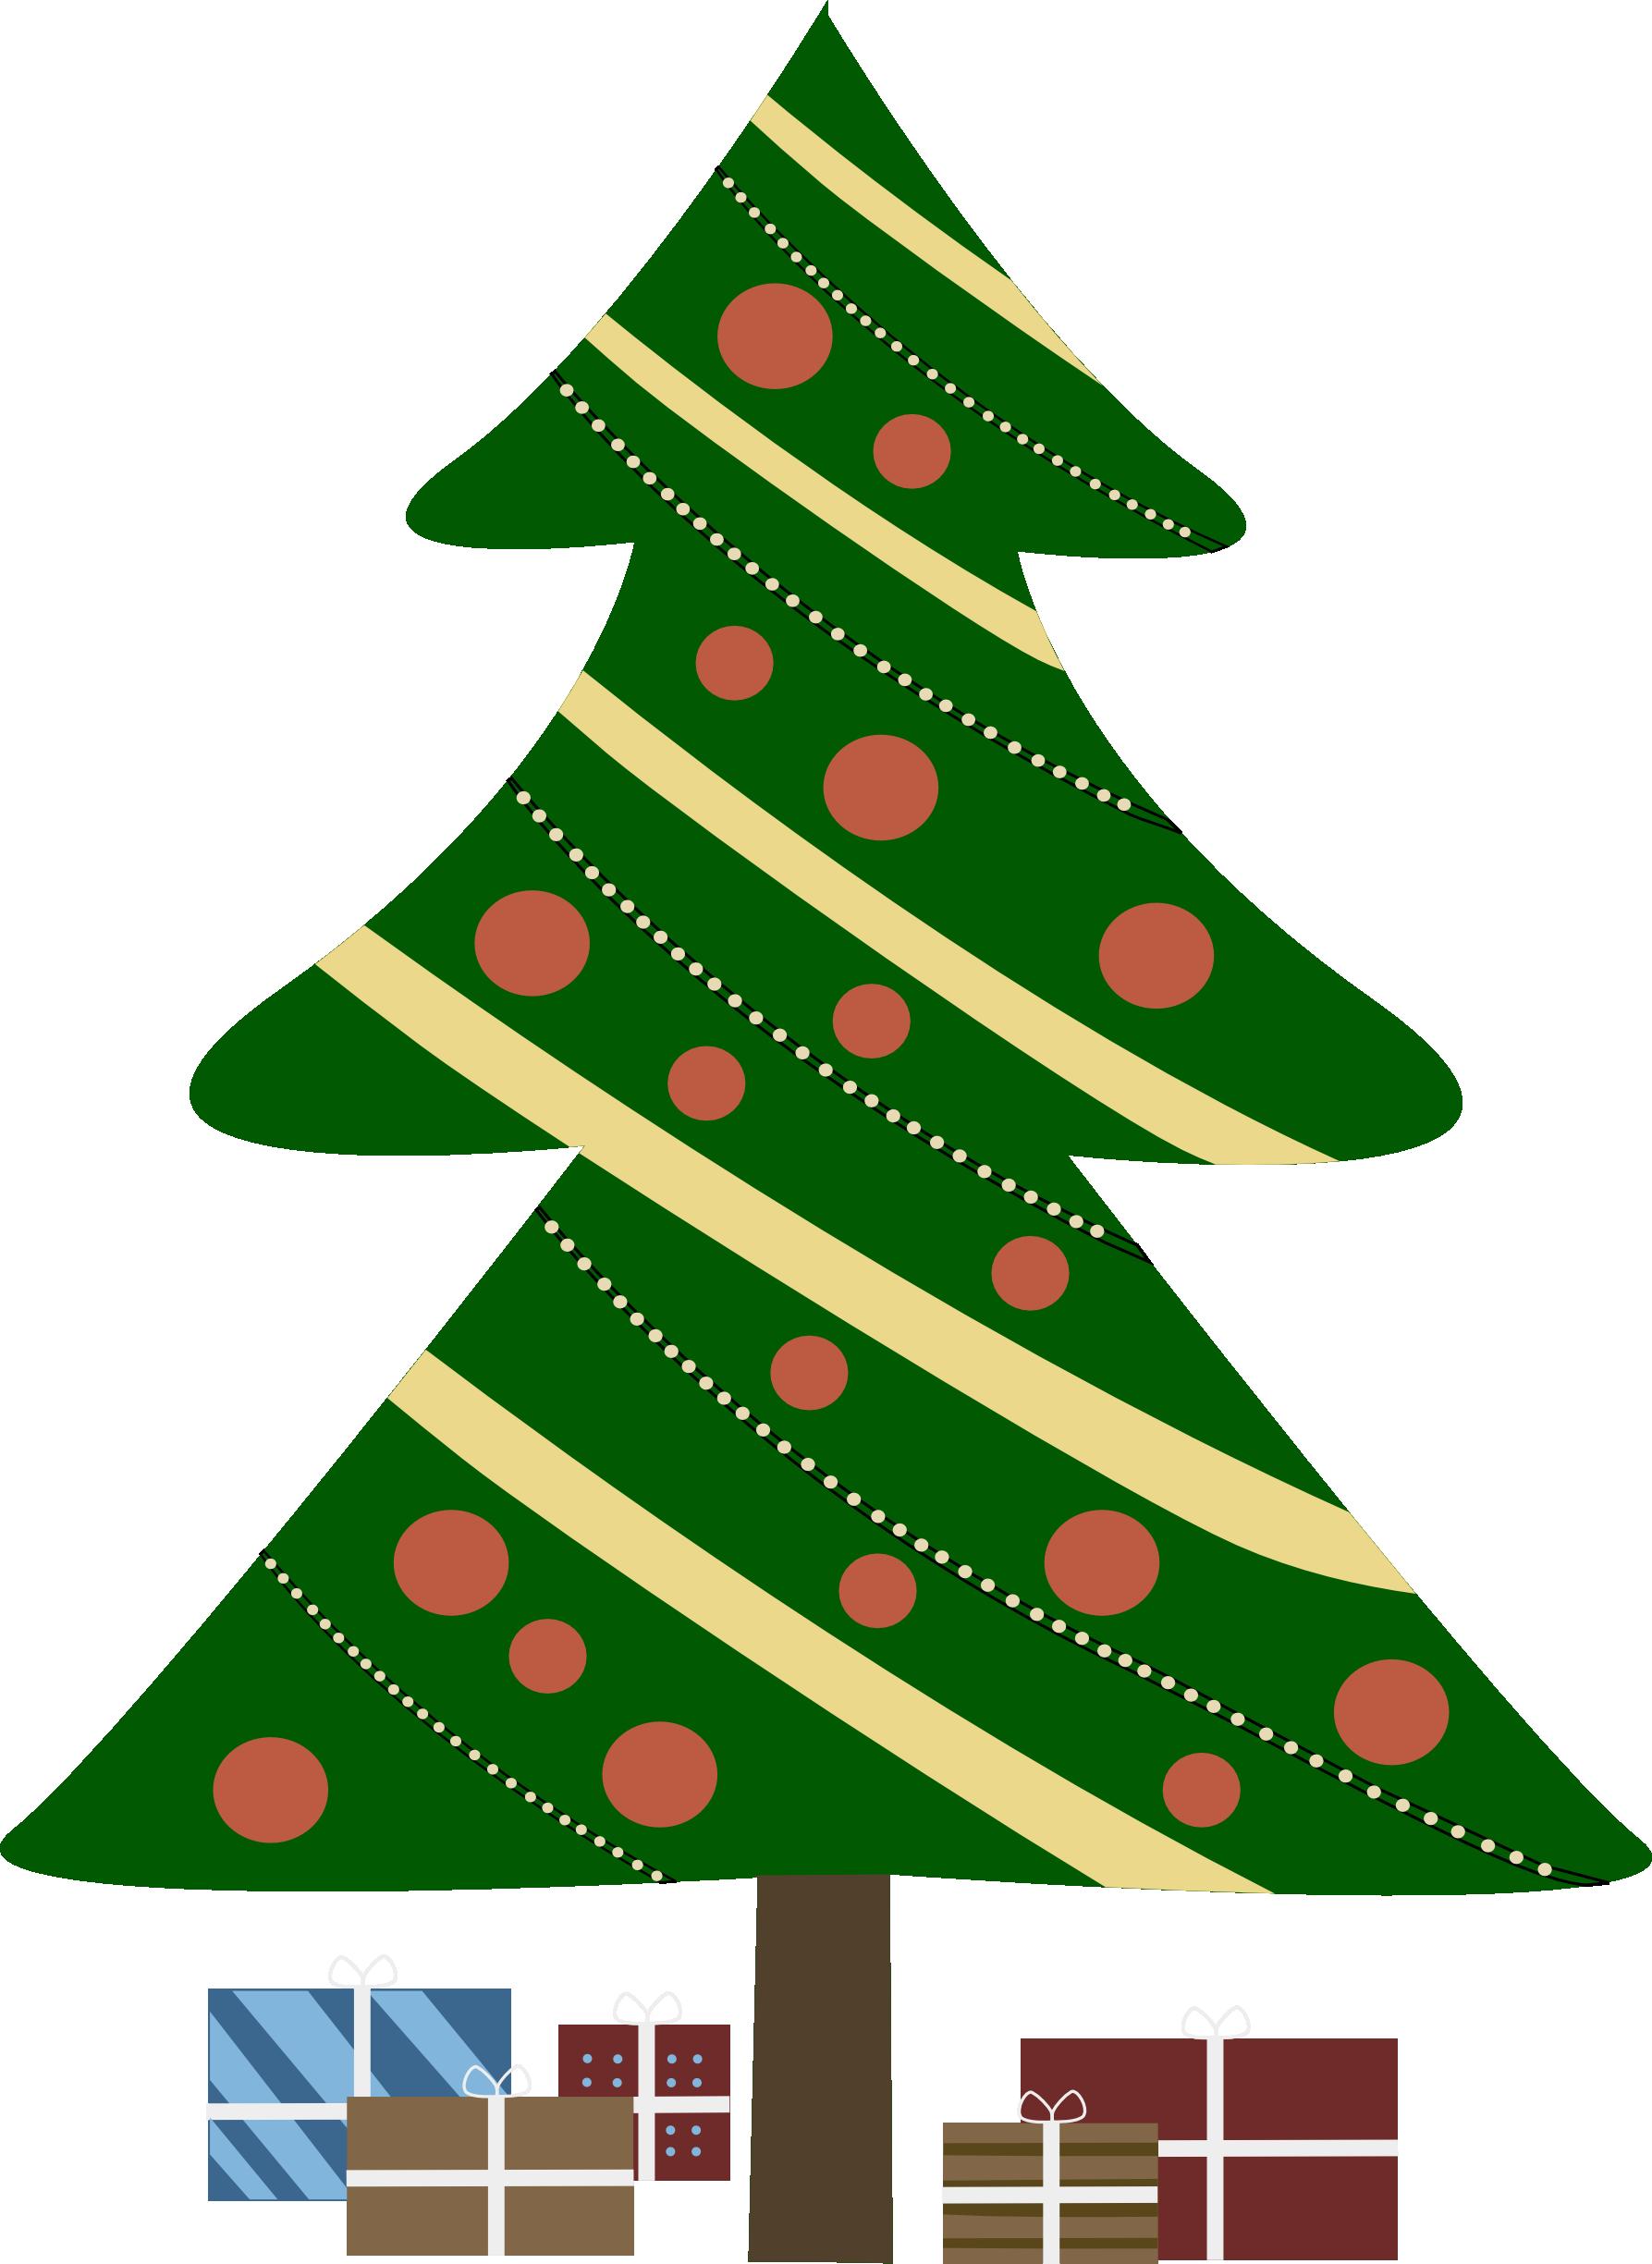 Arbol Animated Christmas Decorations Cartoon Christmas Tree Christmas Tree Images